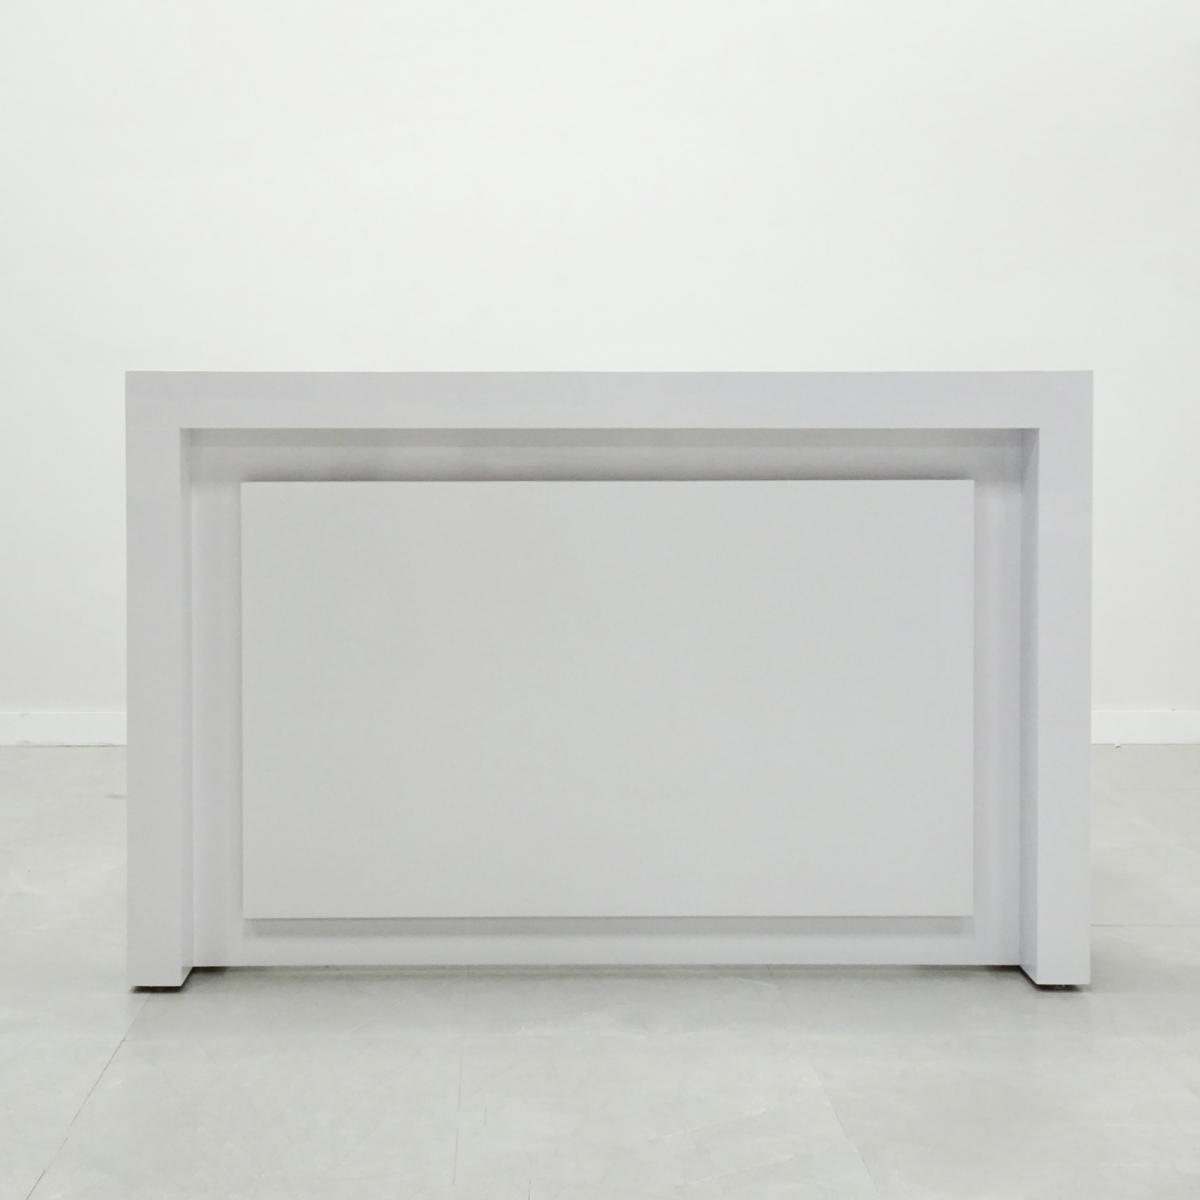 84 In. New York Reception Desk in White Glass Laminate